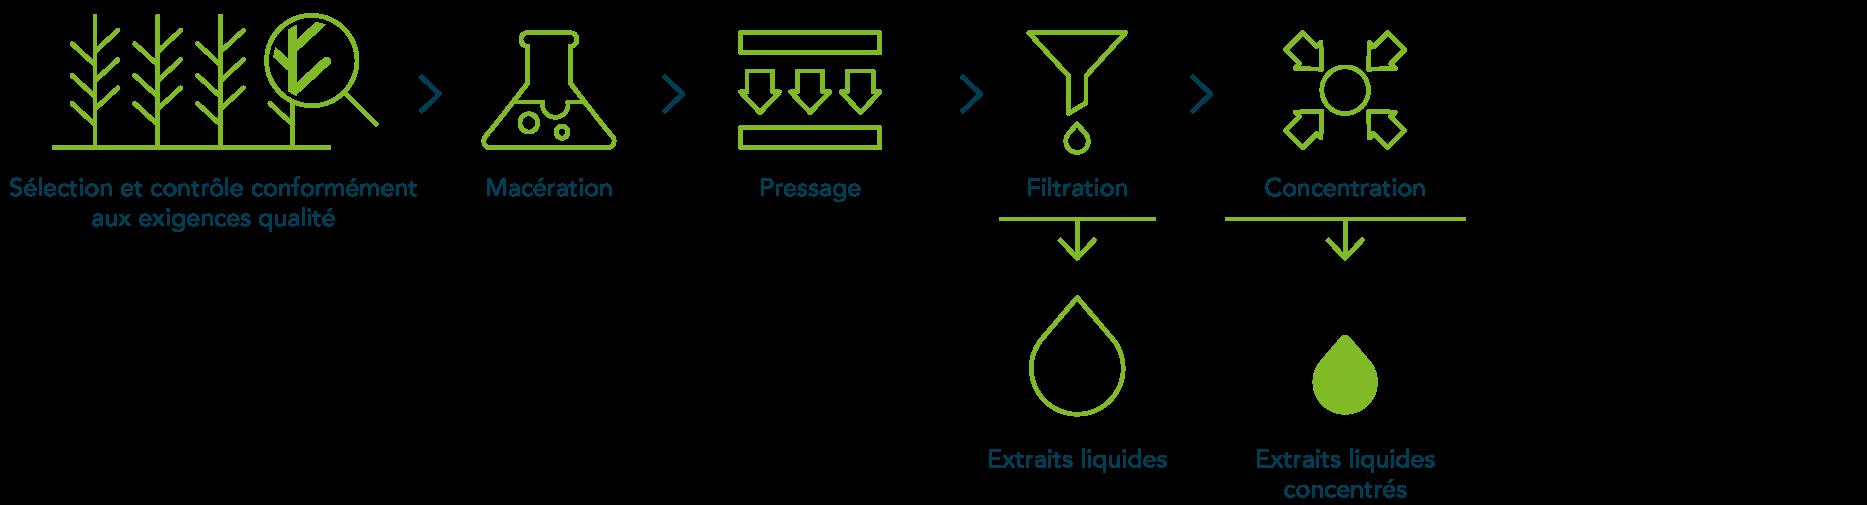 Extraits liquides